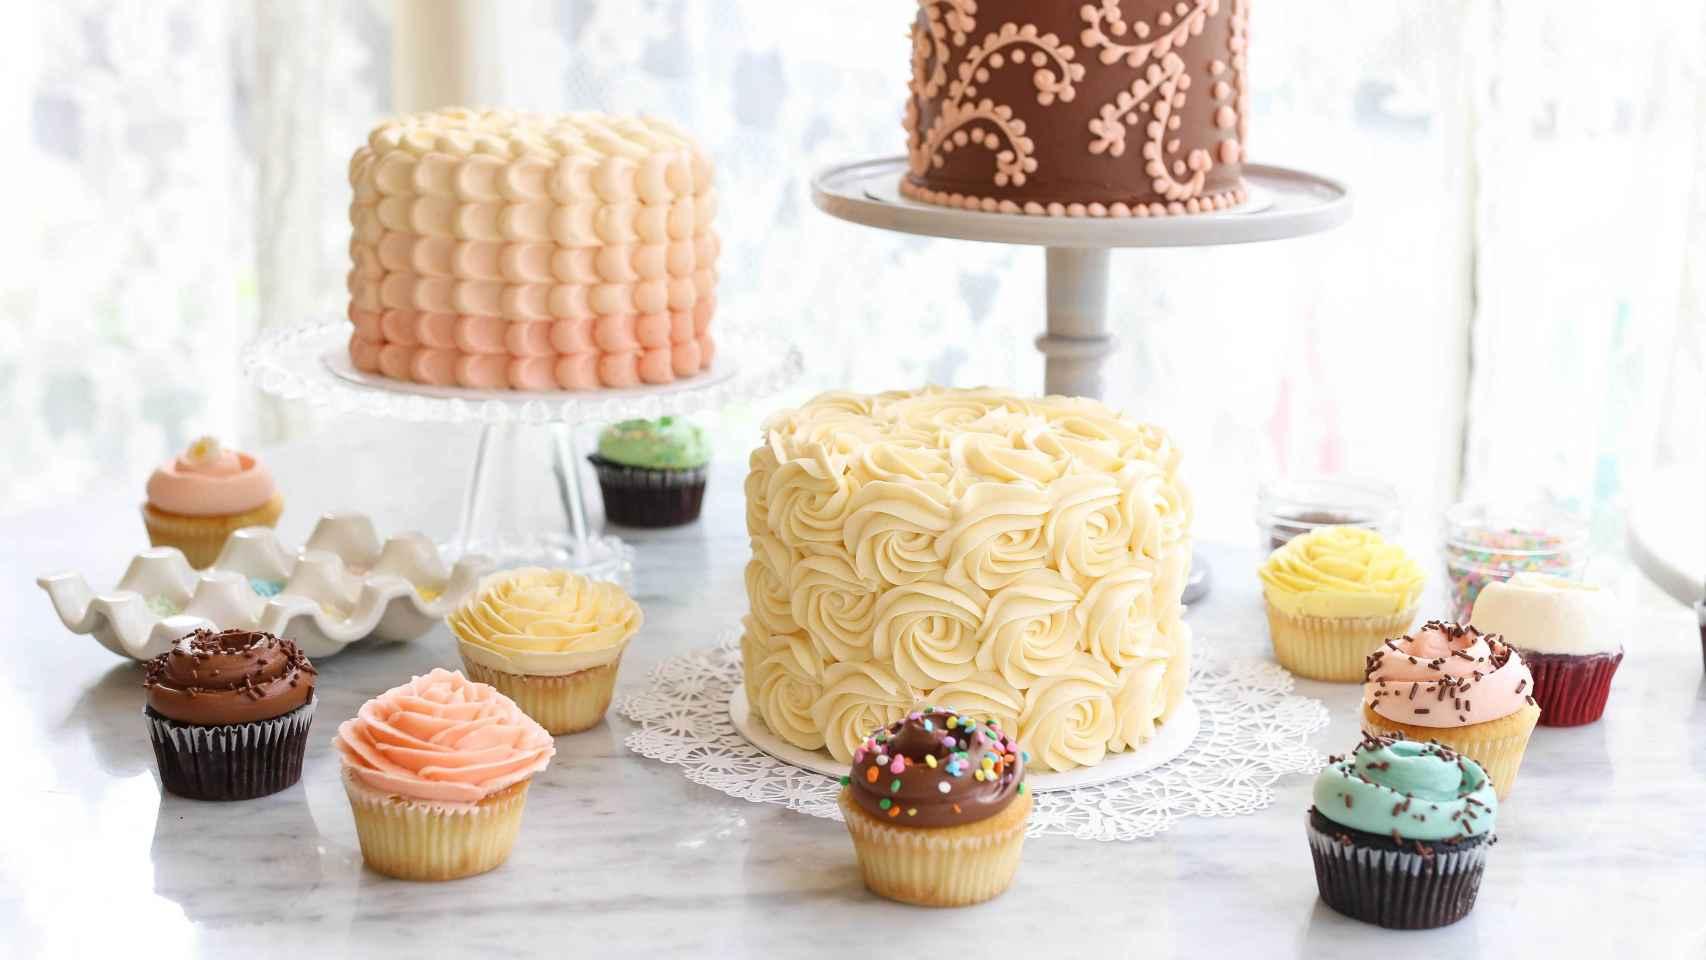 Imagen: Magnolia Bakery